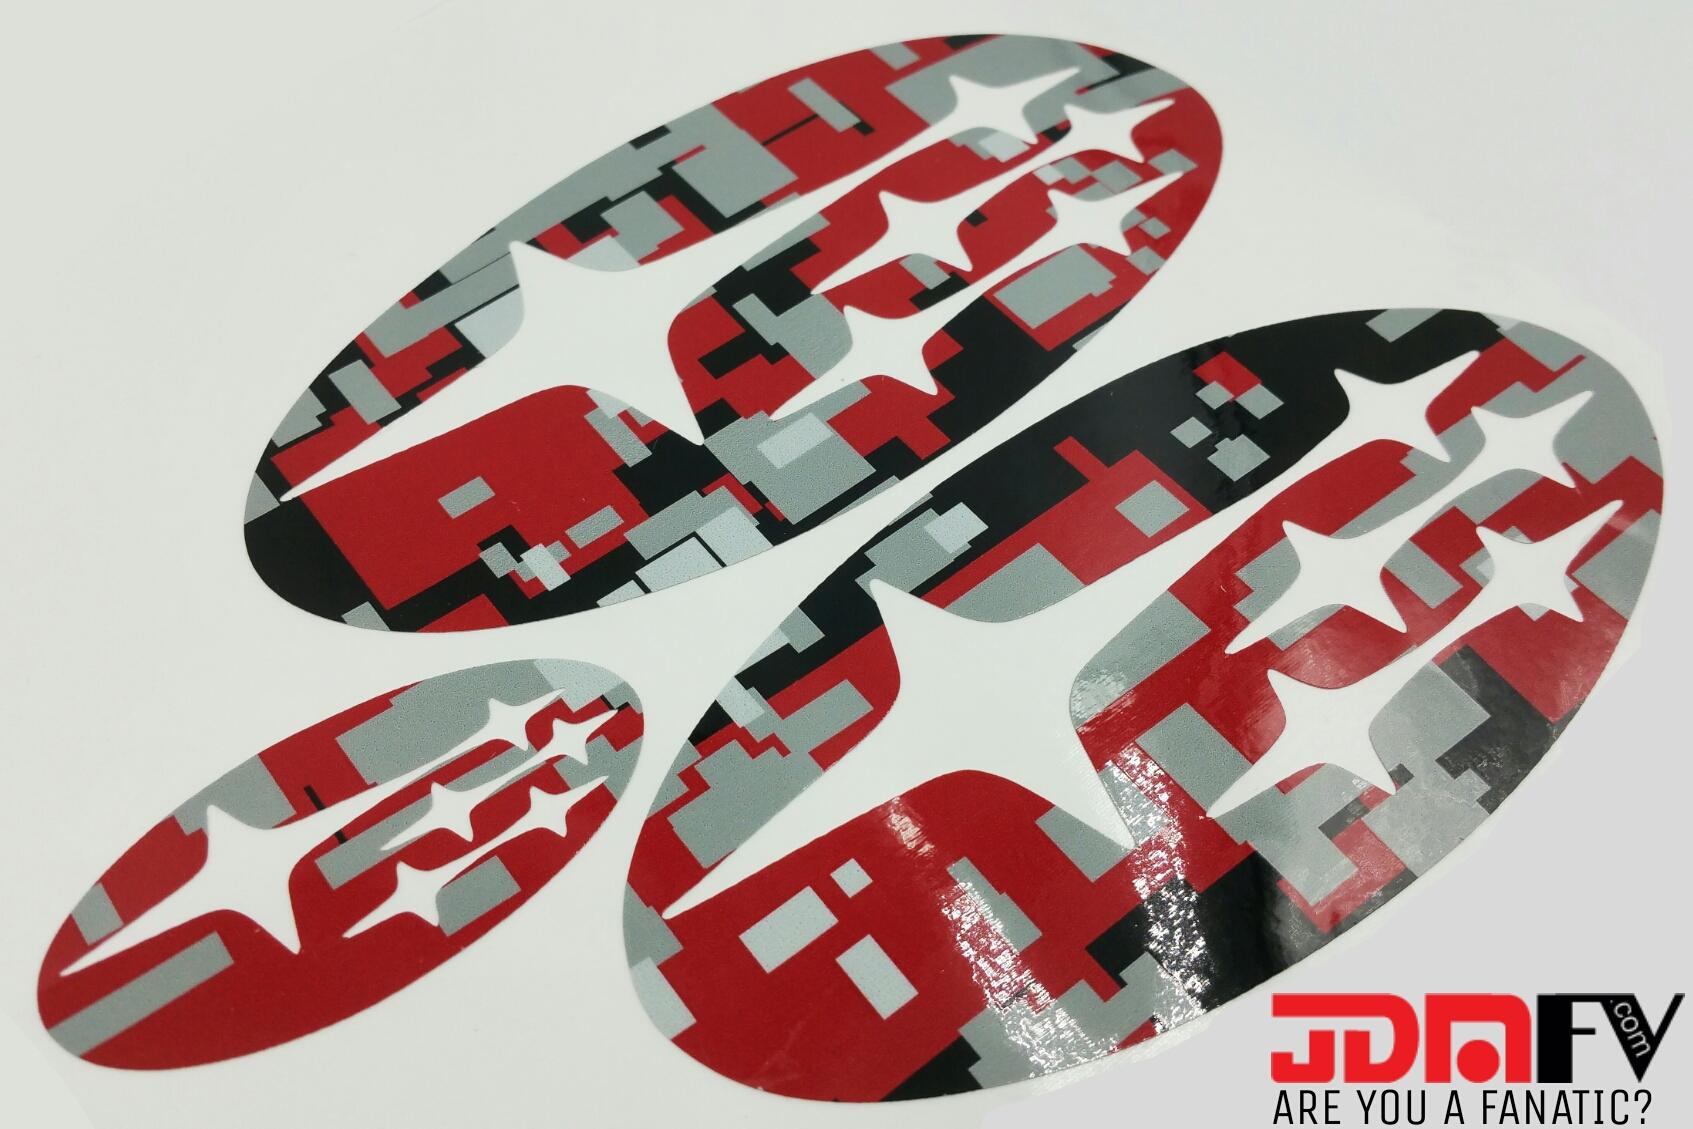 red-camo-emblem-overlays-jdmfv.jpg